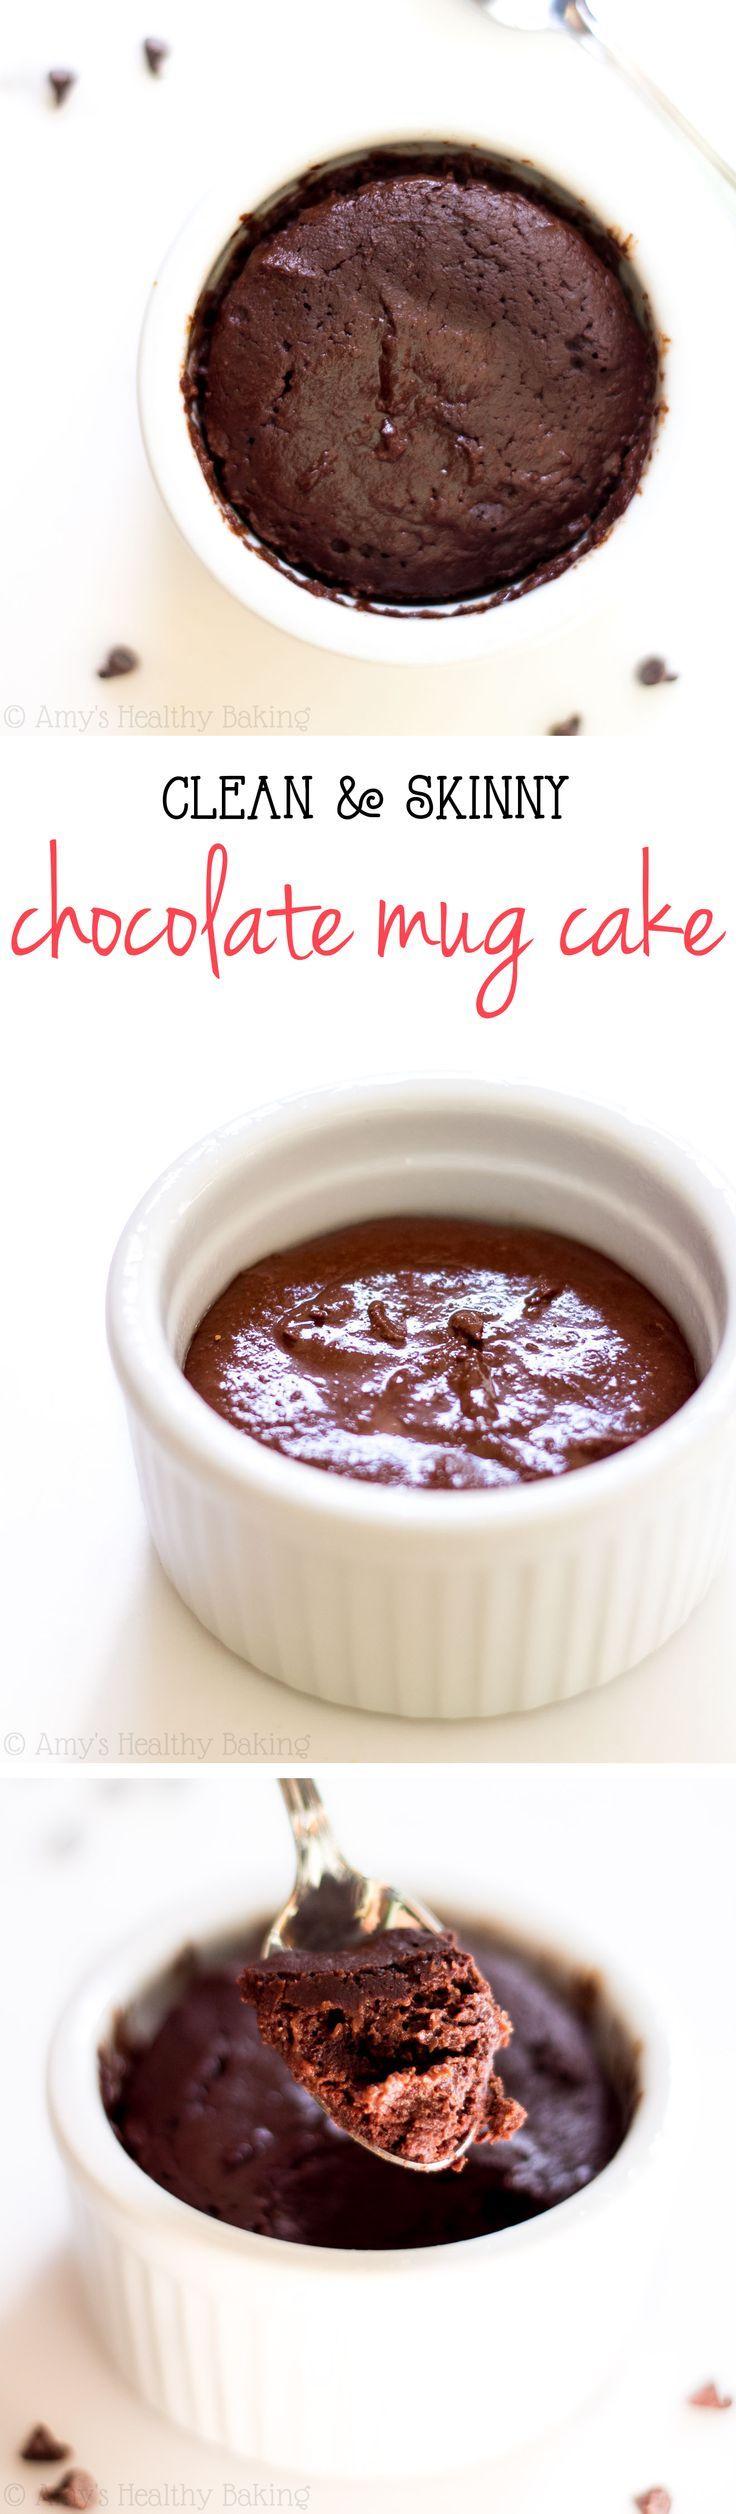 Single Serving Clean Chocolate Mug Cake {Recipe Video!}